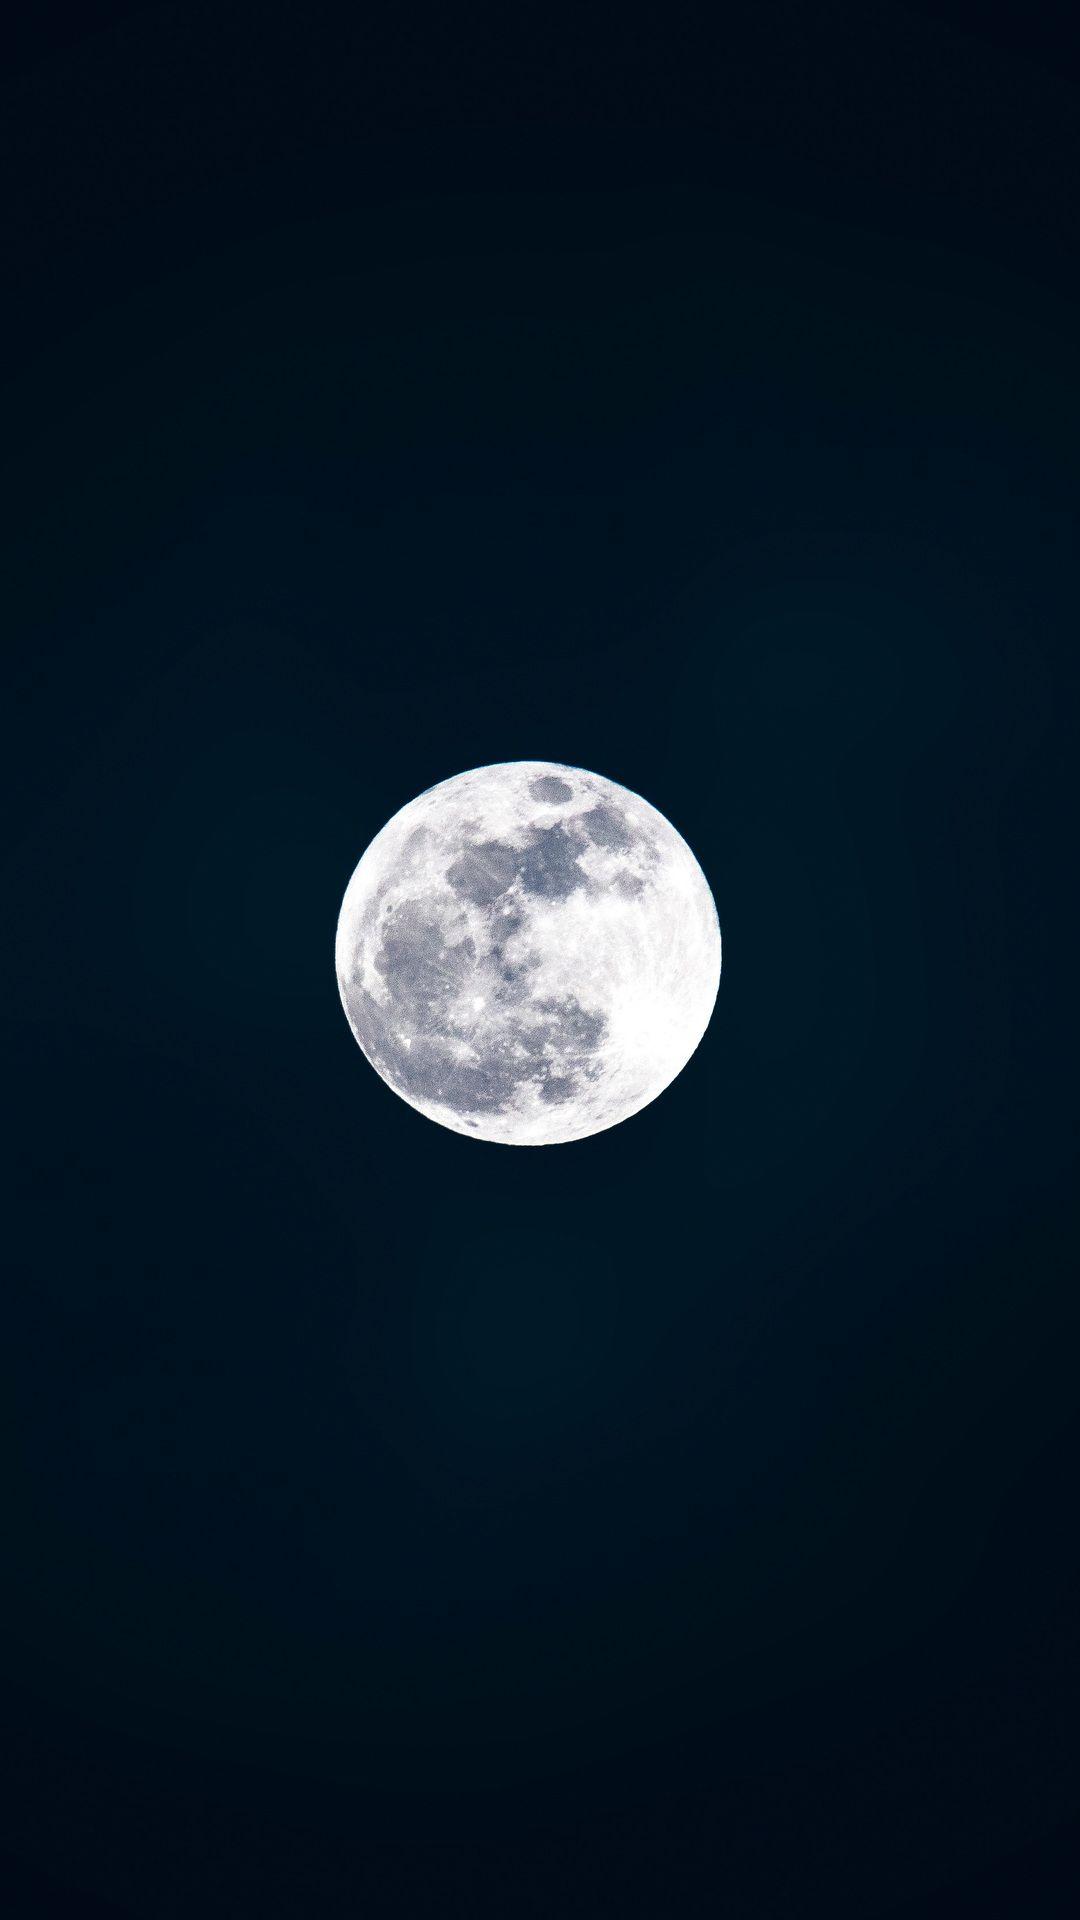 Full Moon 4k In 1080x1920 Resolution Full Moon Images Full Moon Pictures Full Moon